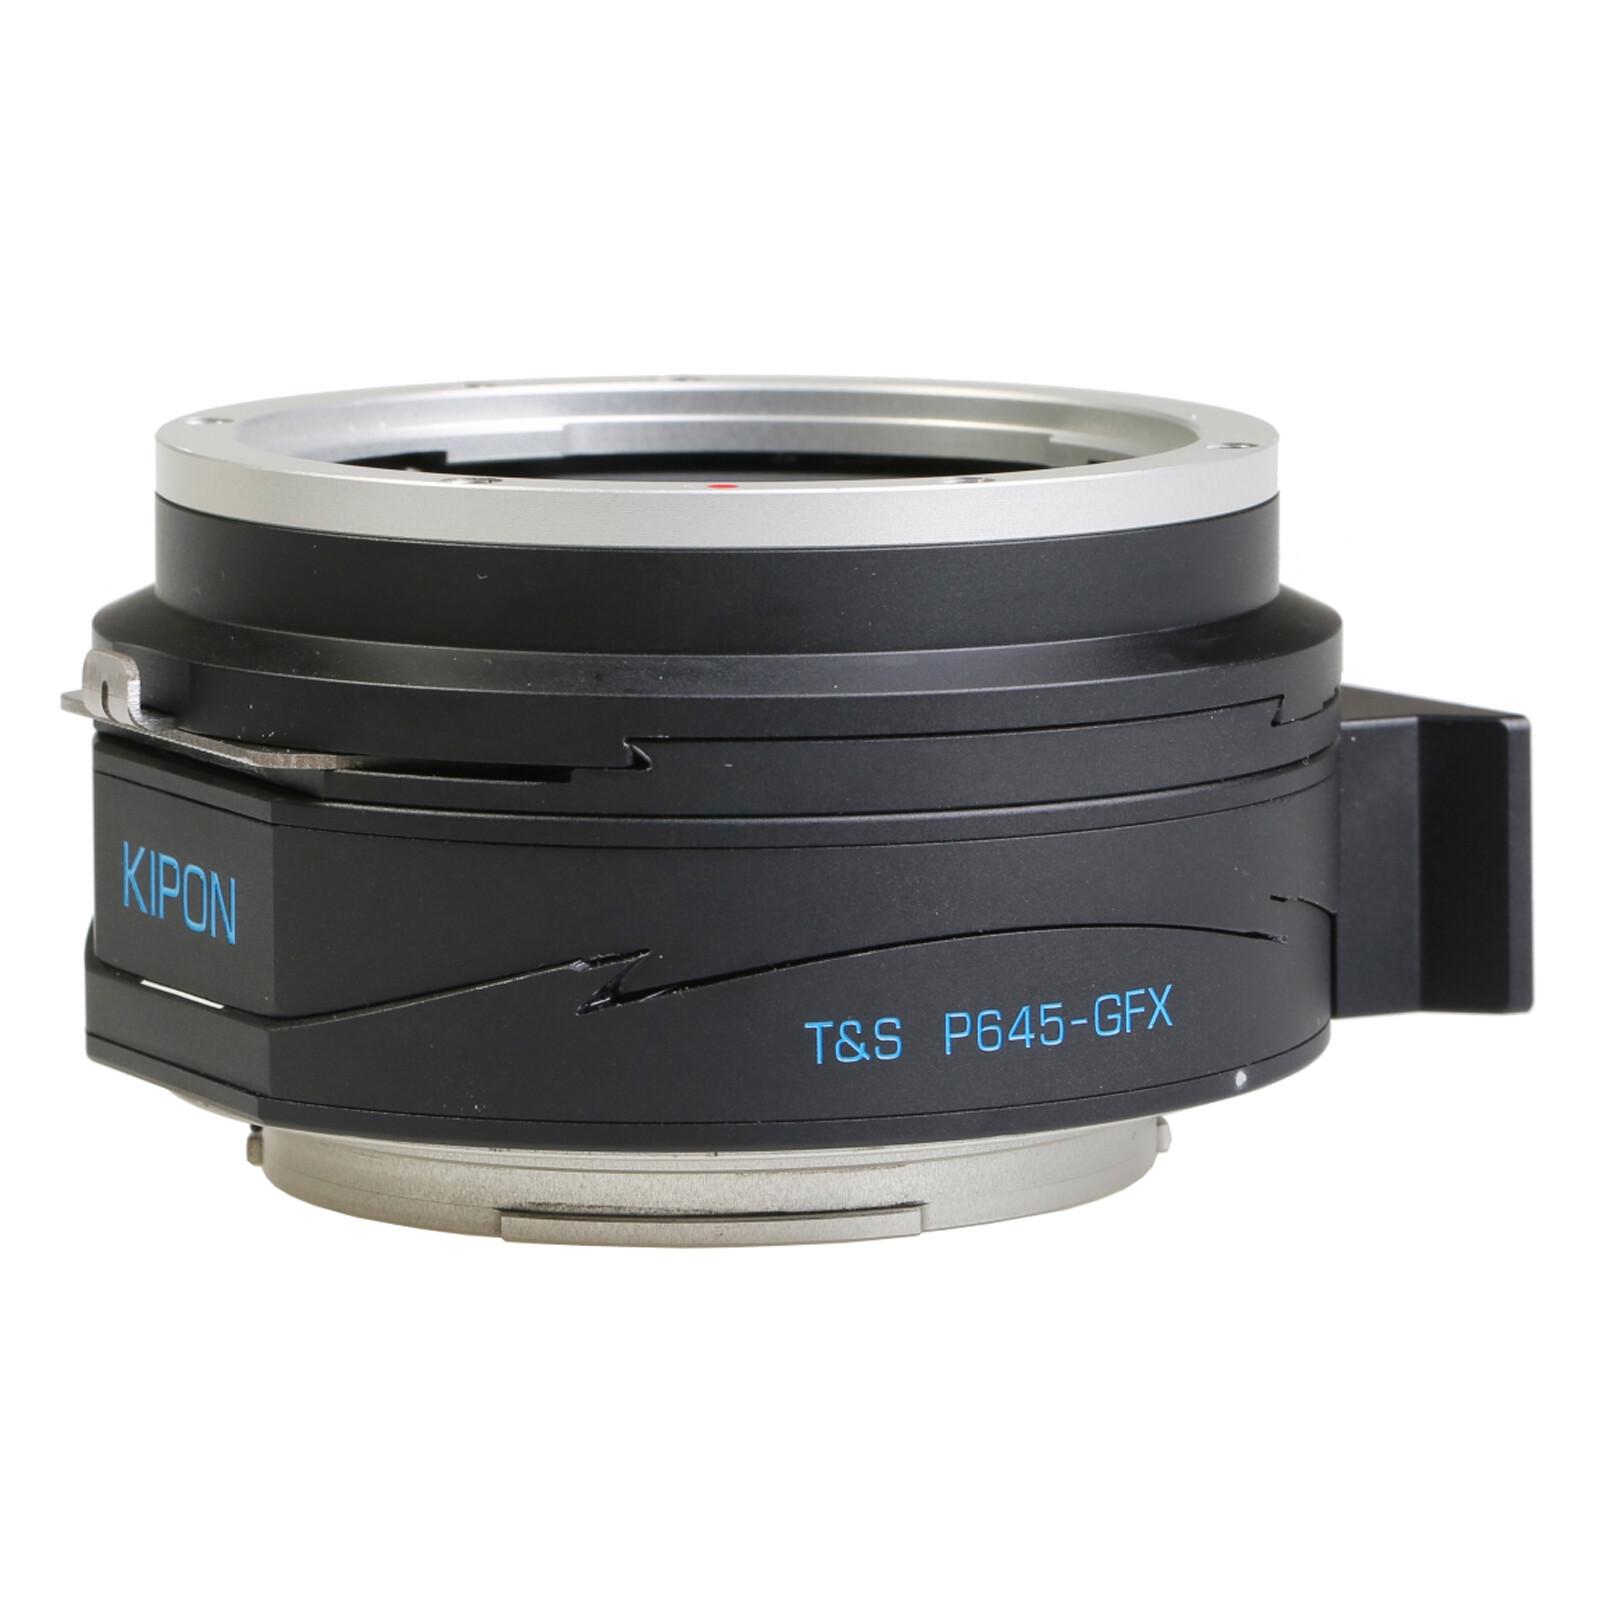 Kipon Pro T-S Adapter für Pentax 645 auf Fuji GFX